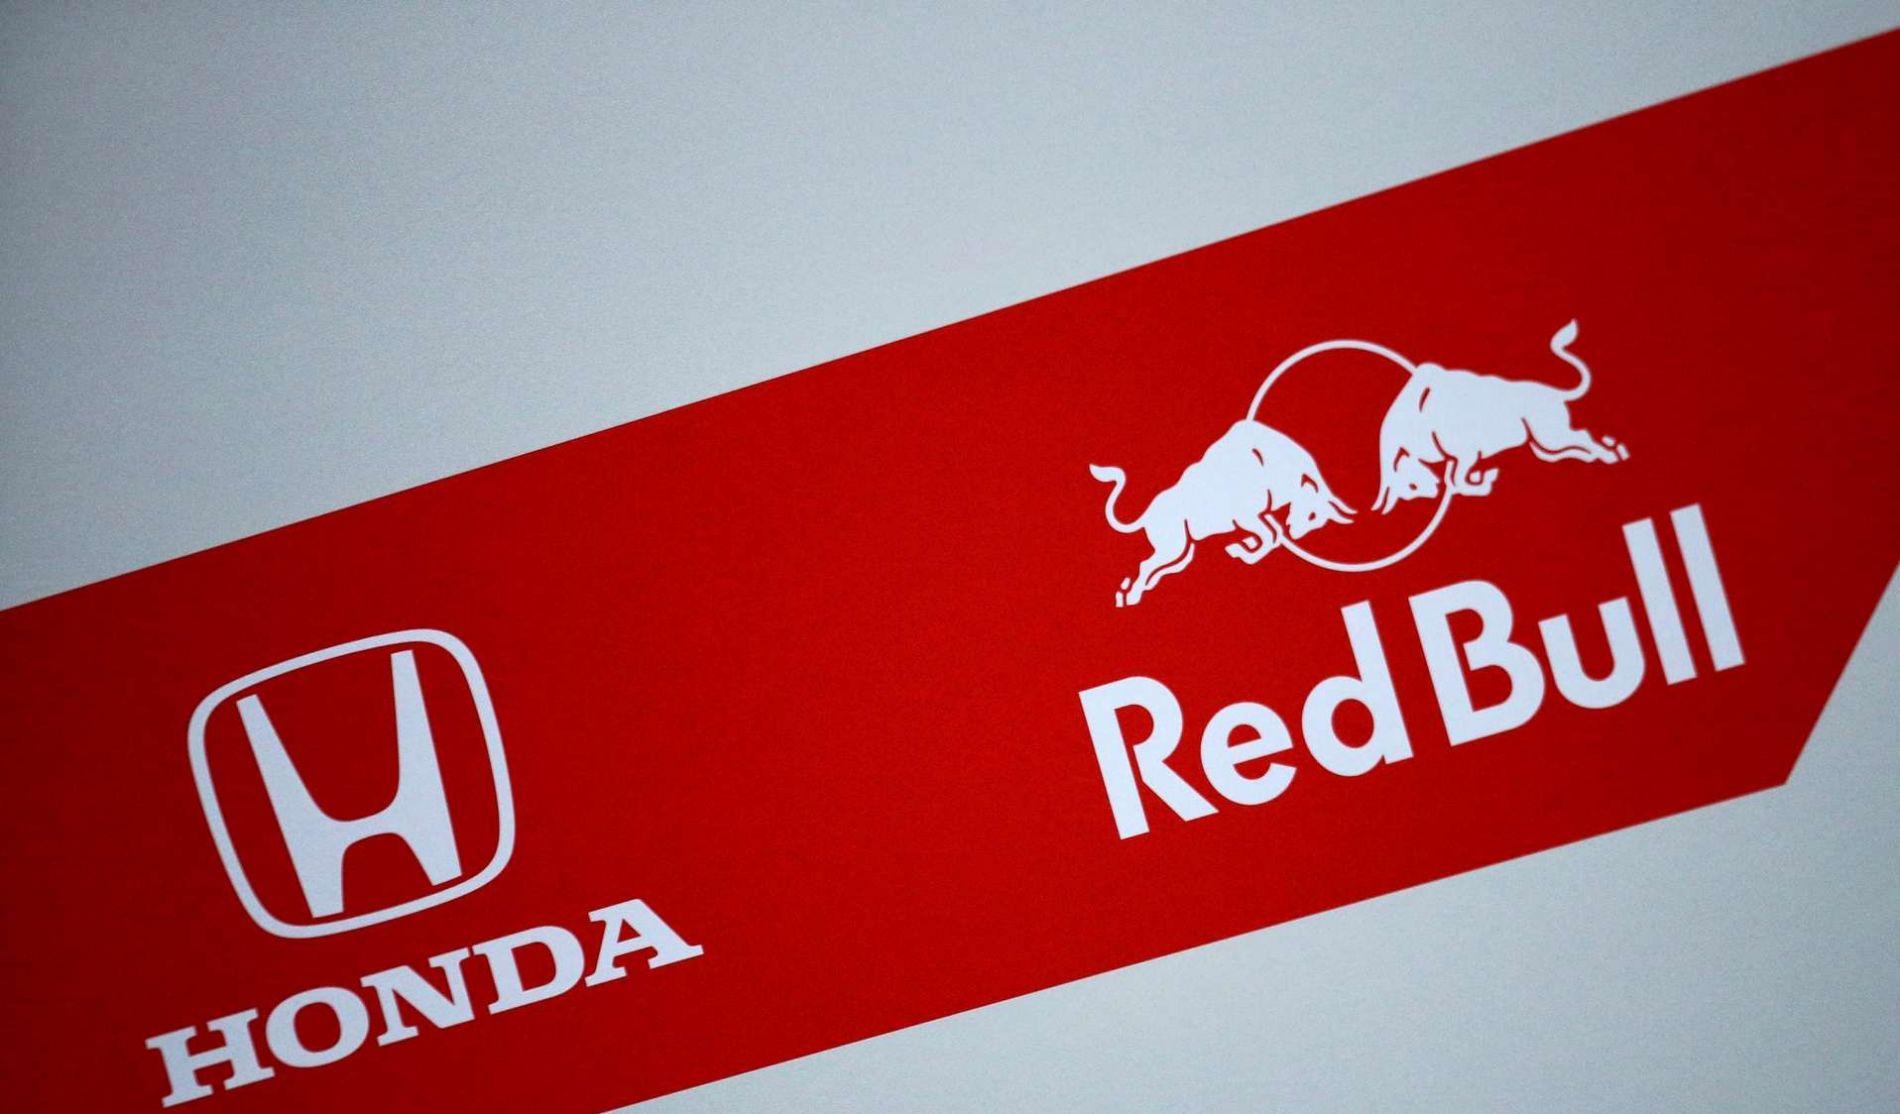 Red Bull Racing ძრავების წარმოებას აპირებს